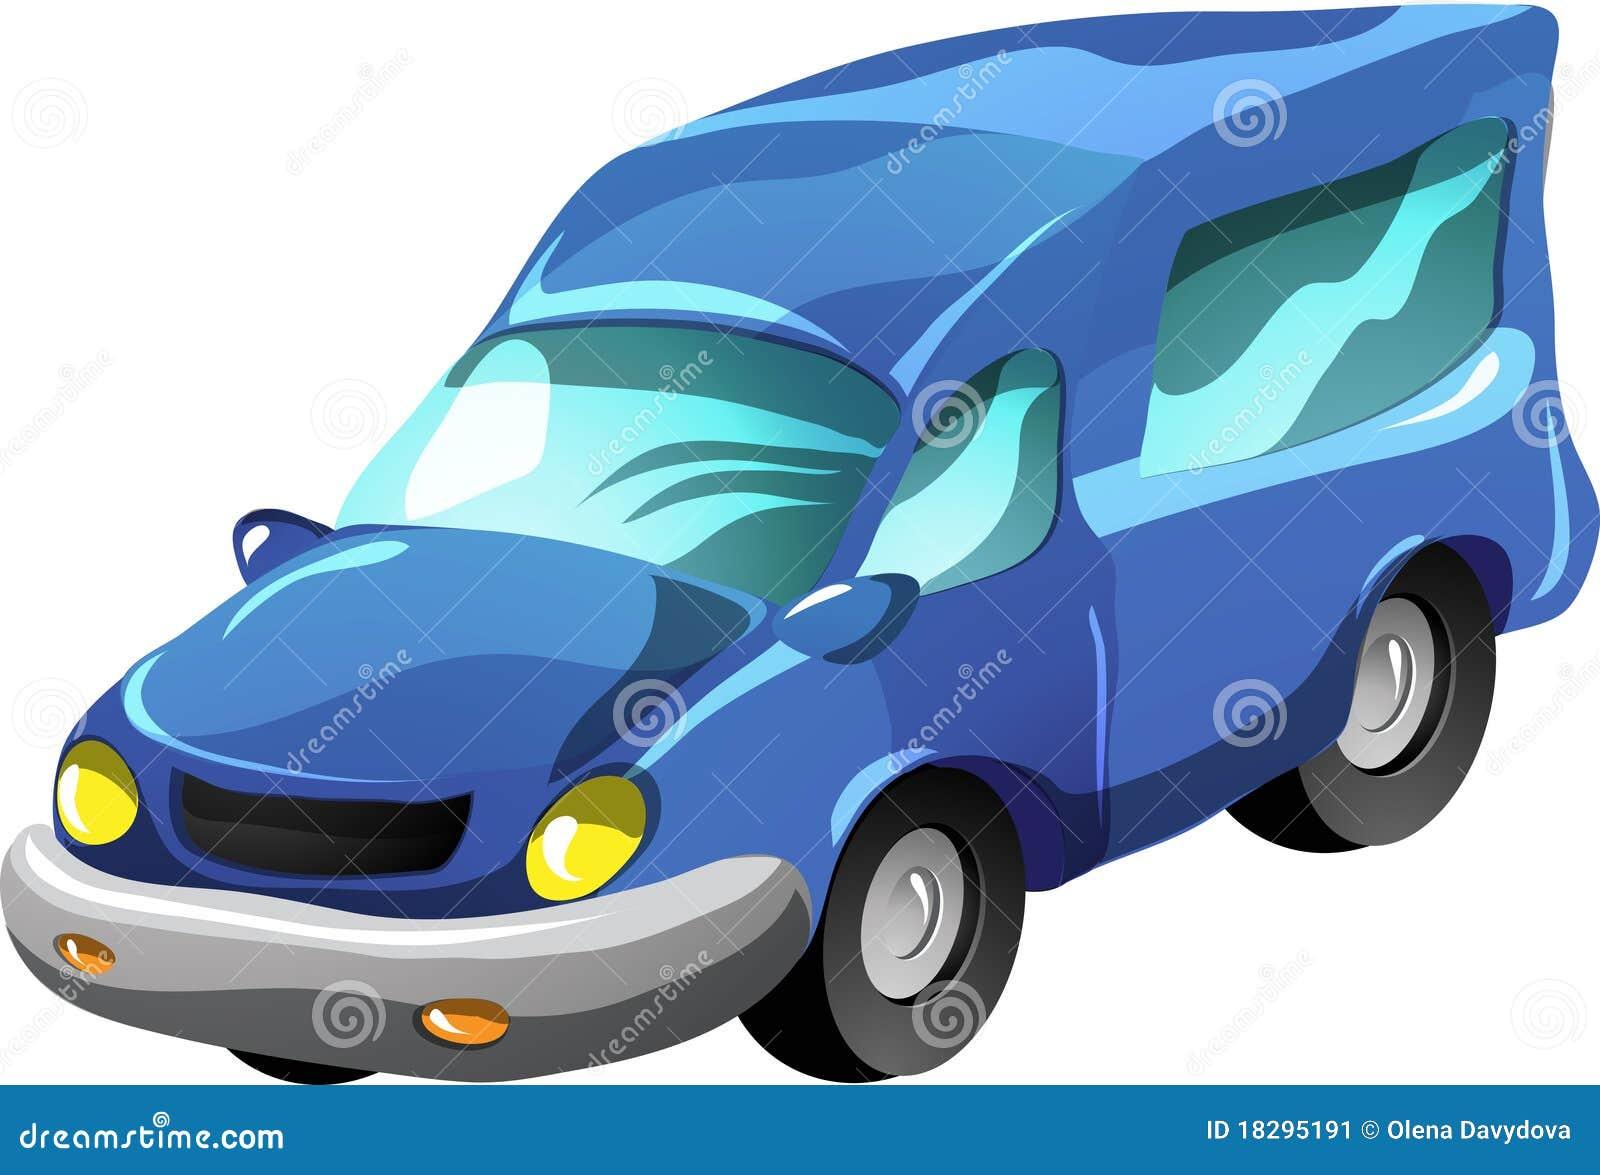 Cartoon Minibus Stock Image - Image: 18295191